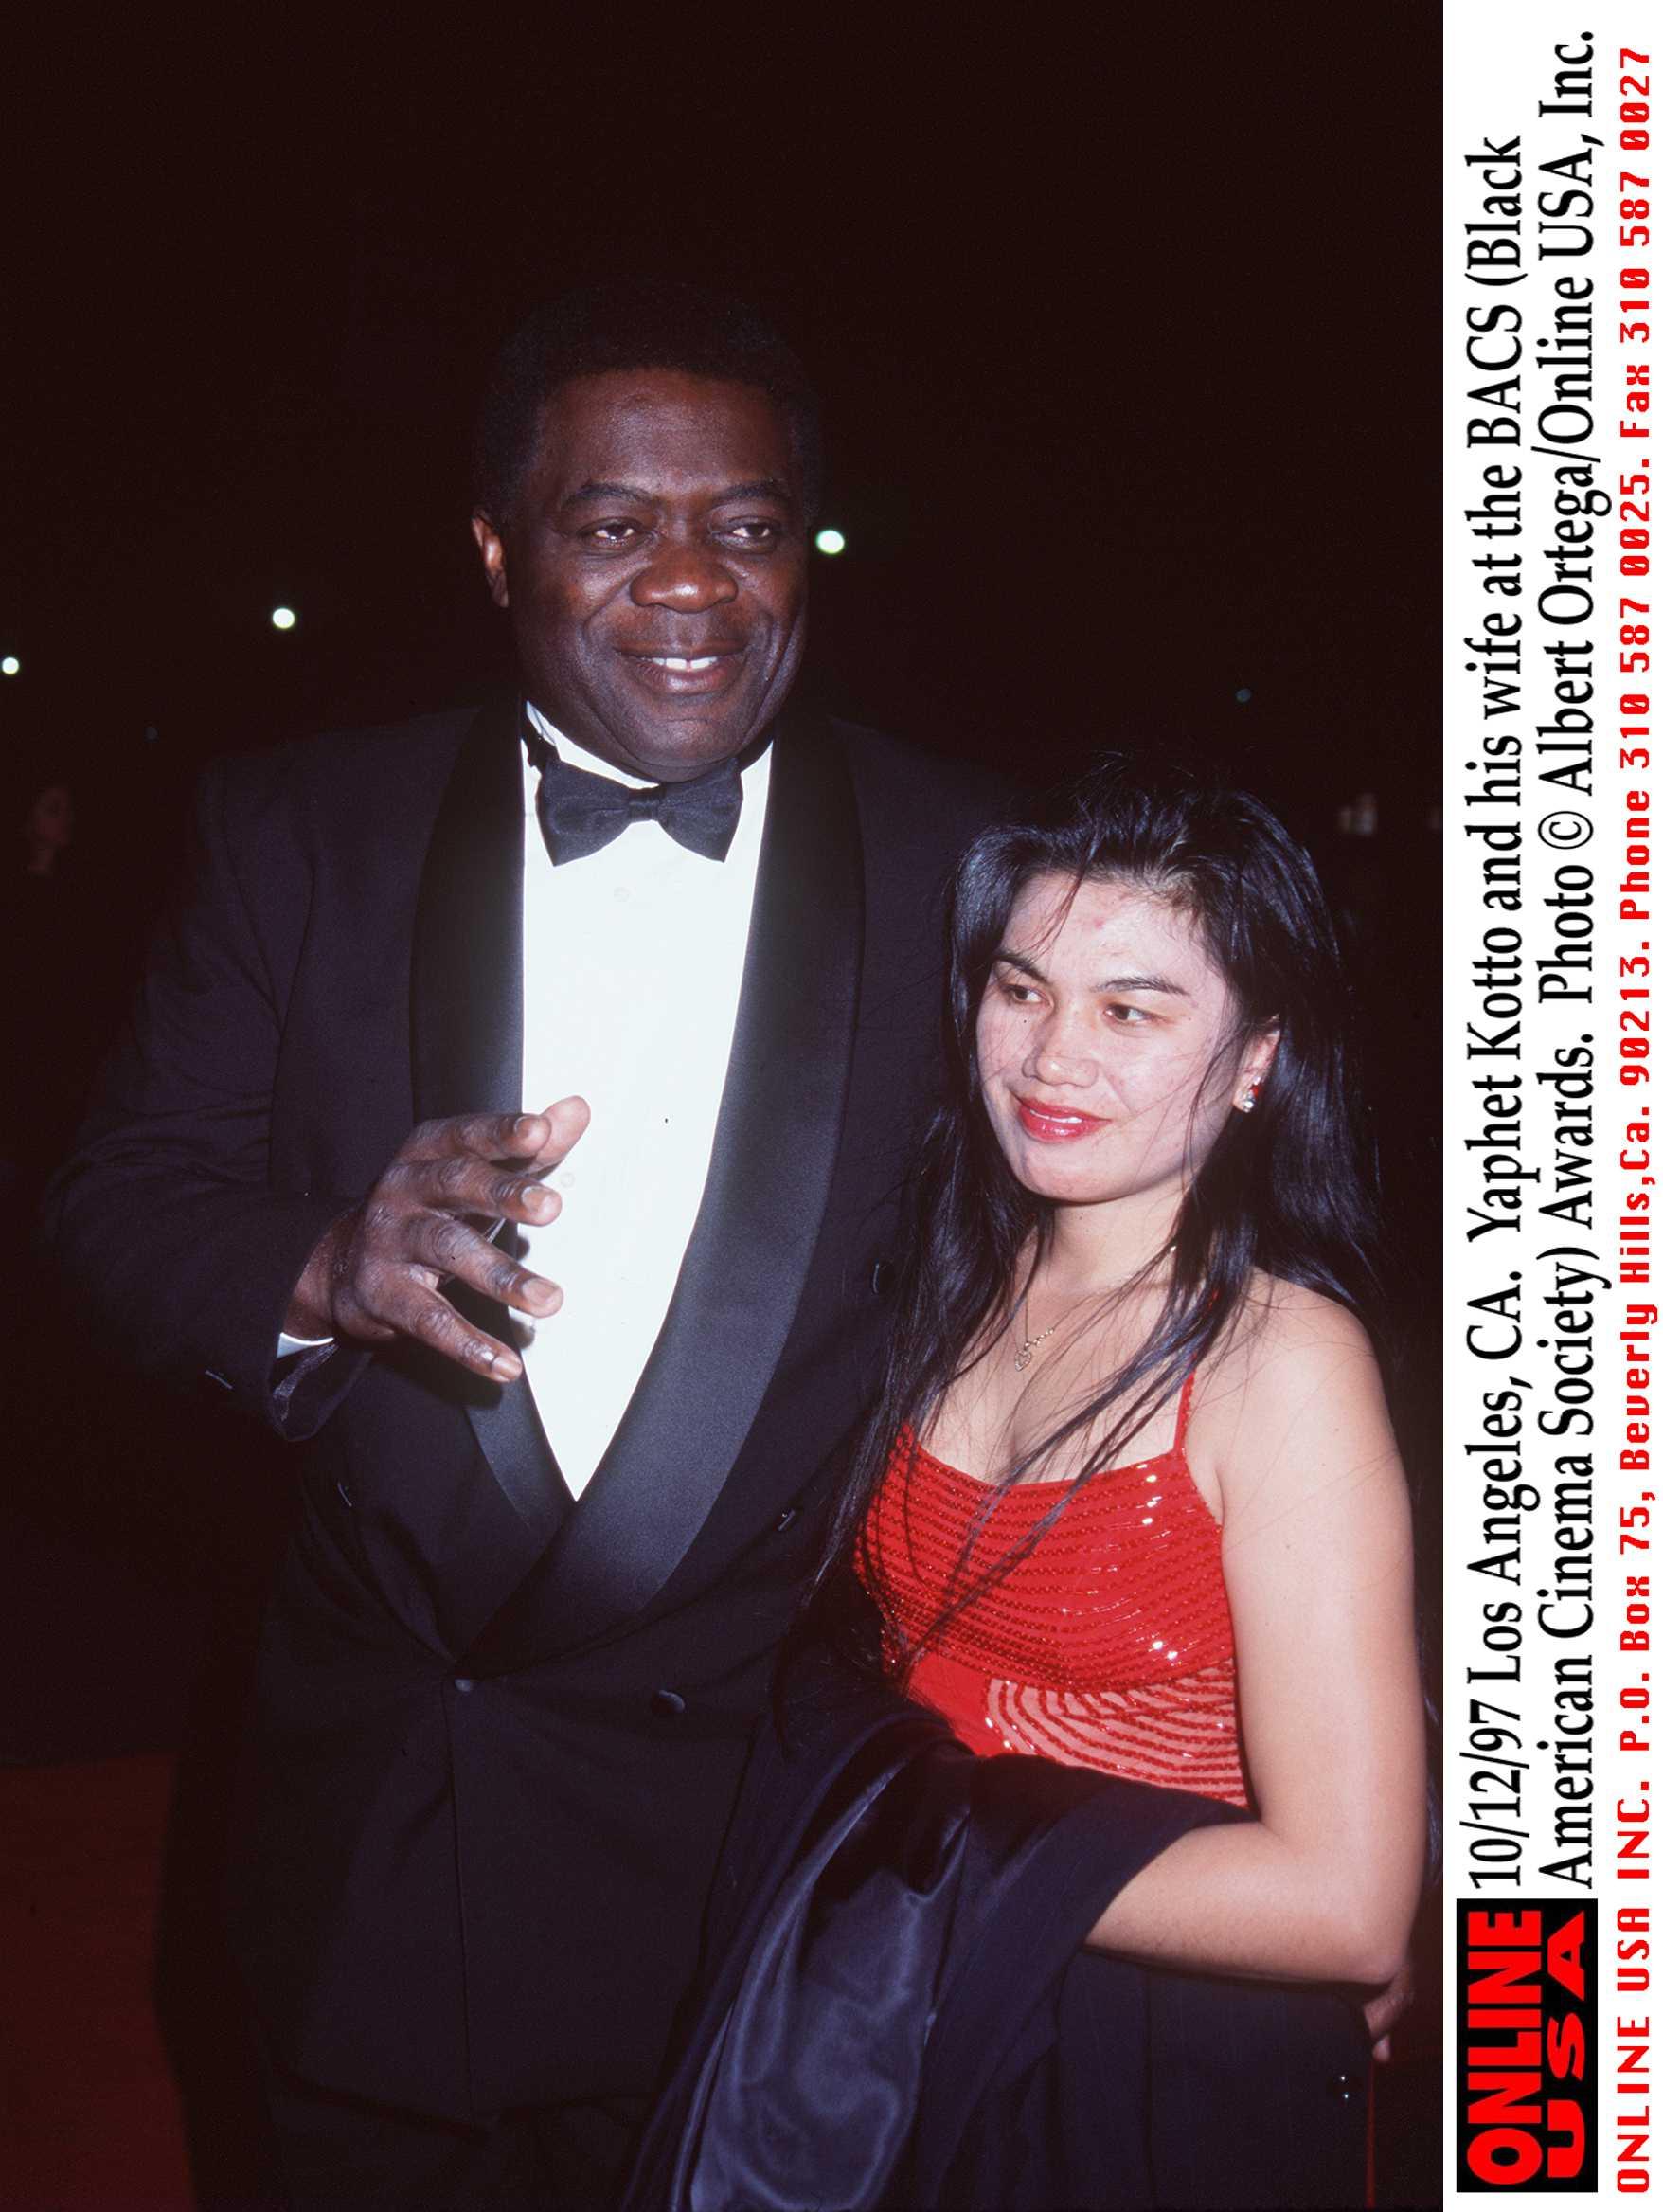 Yaphet Kotto and his wife